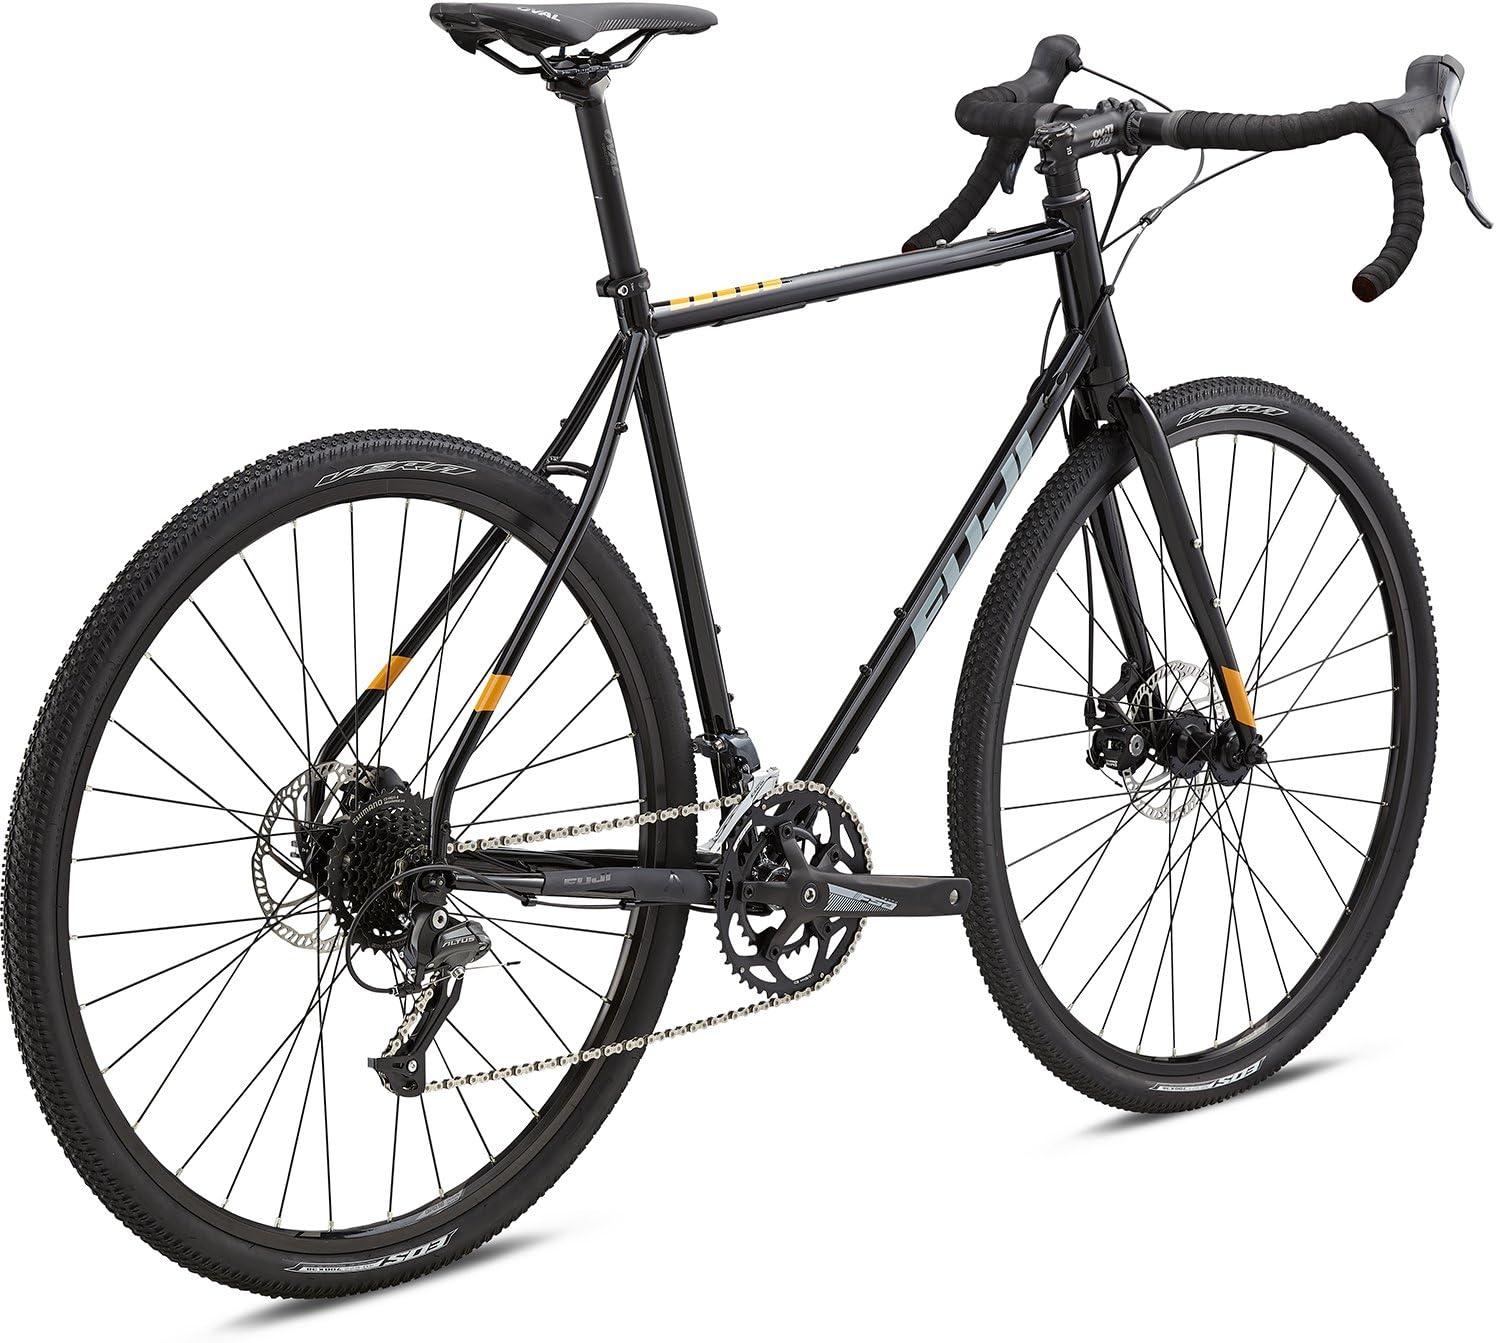 Bicicleta de carretera Gravel Bike Fuji Jari 2.5 2018 – 54 cm ...